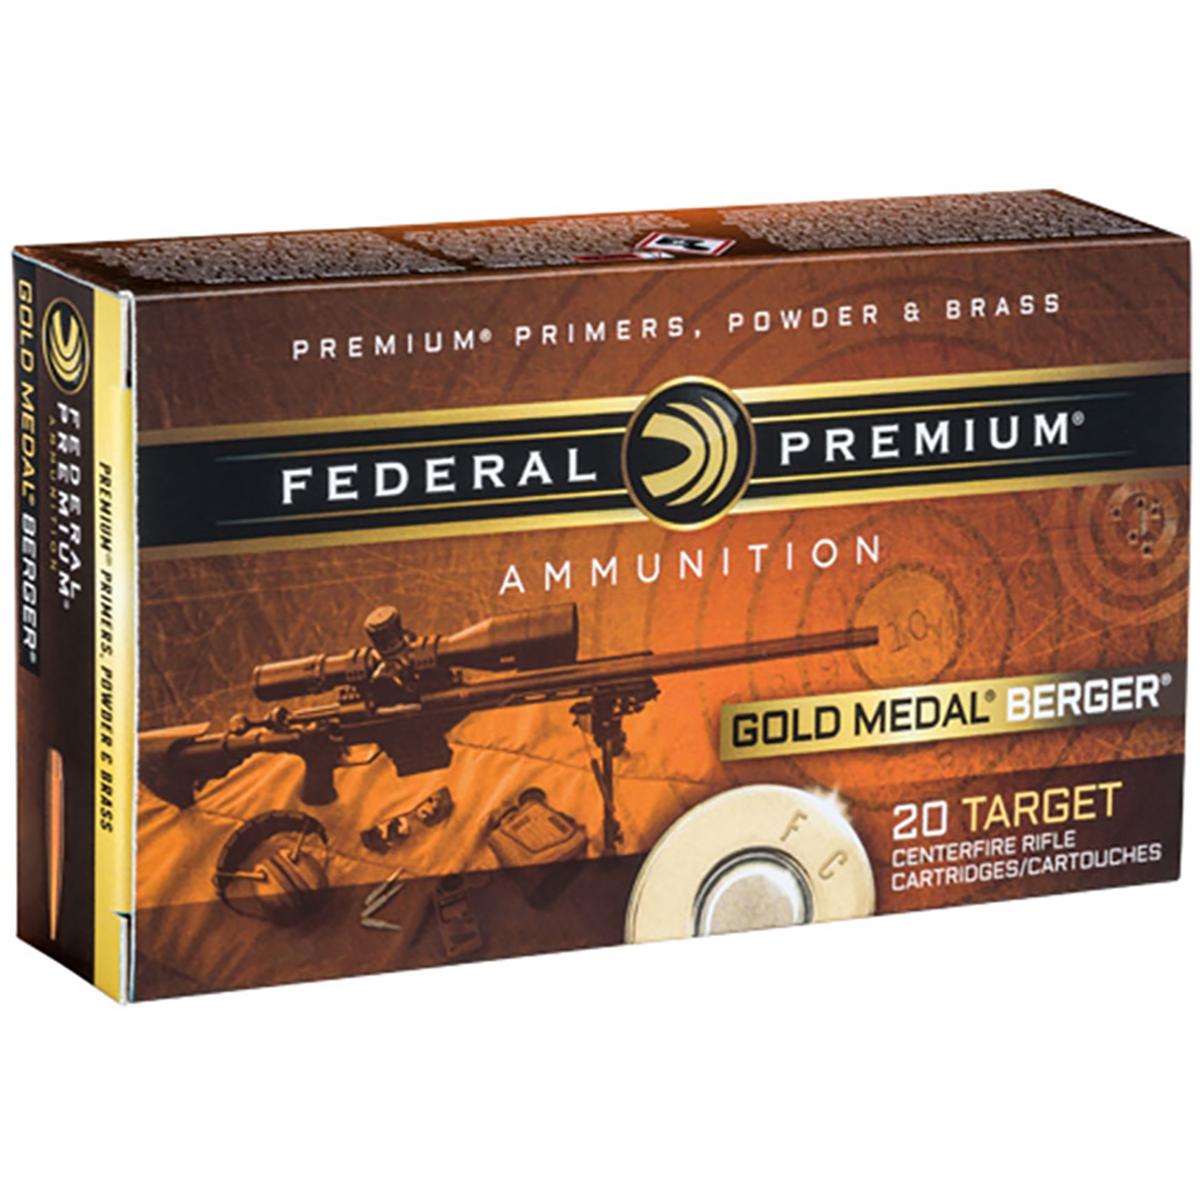 Federal Gold Medal Berger Ammo, 6.5mm Creedmoor, 130-gr, Hybrid OTM